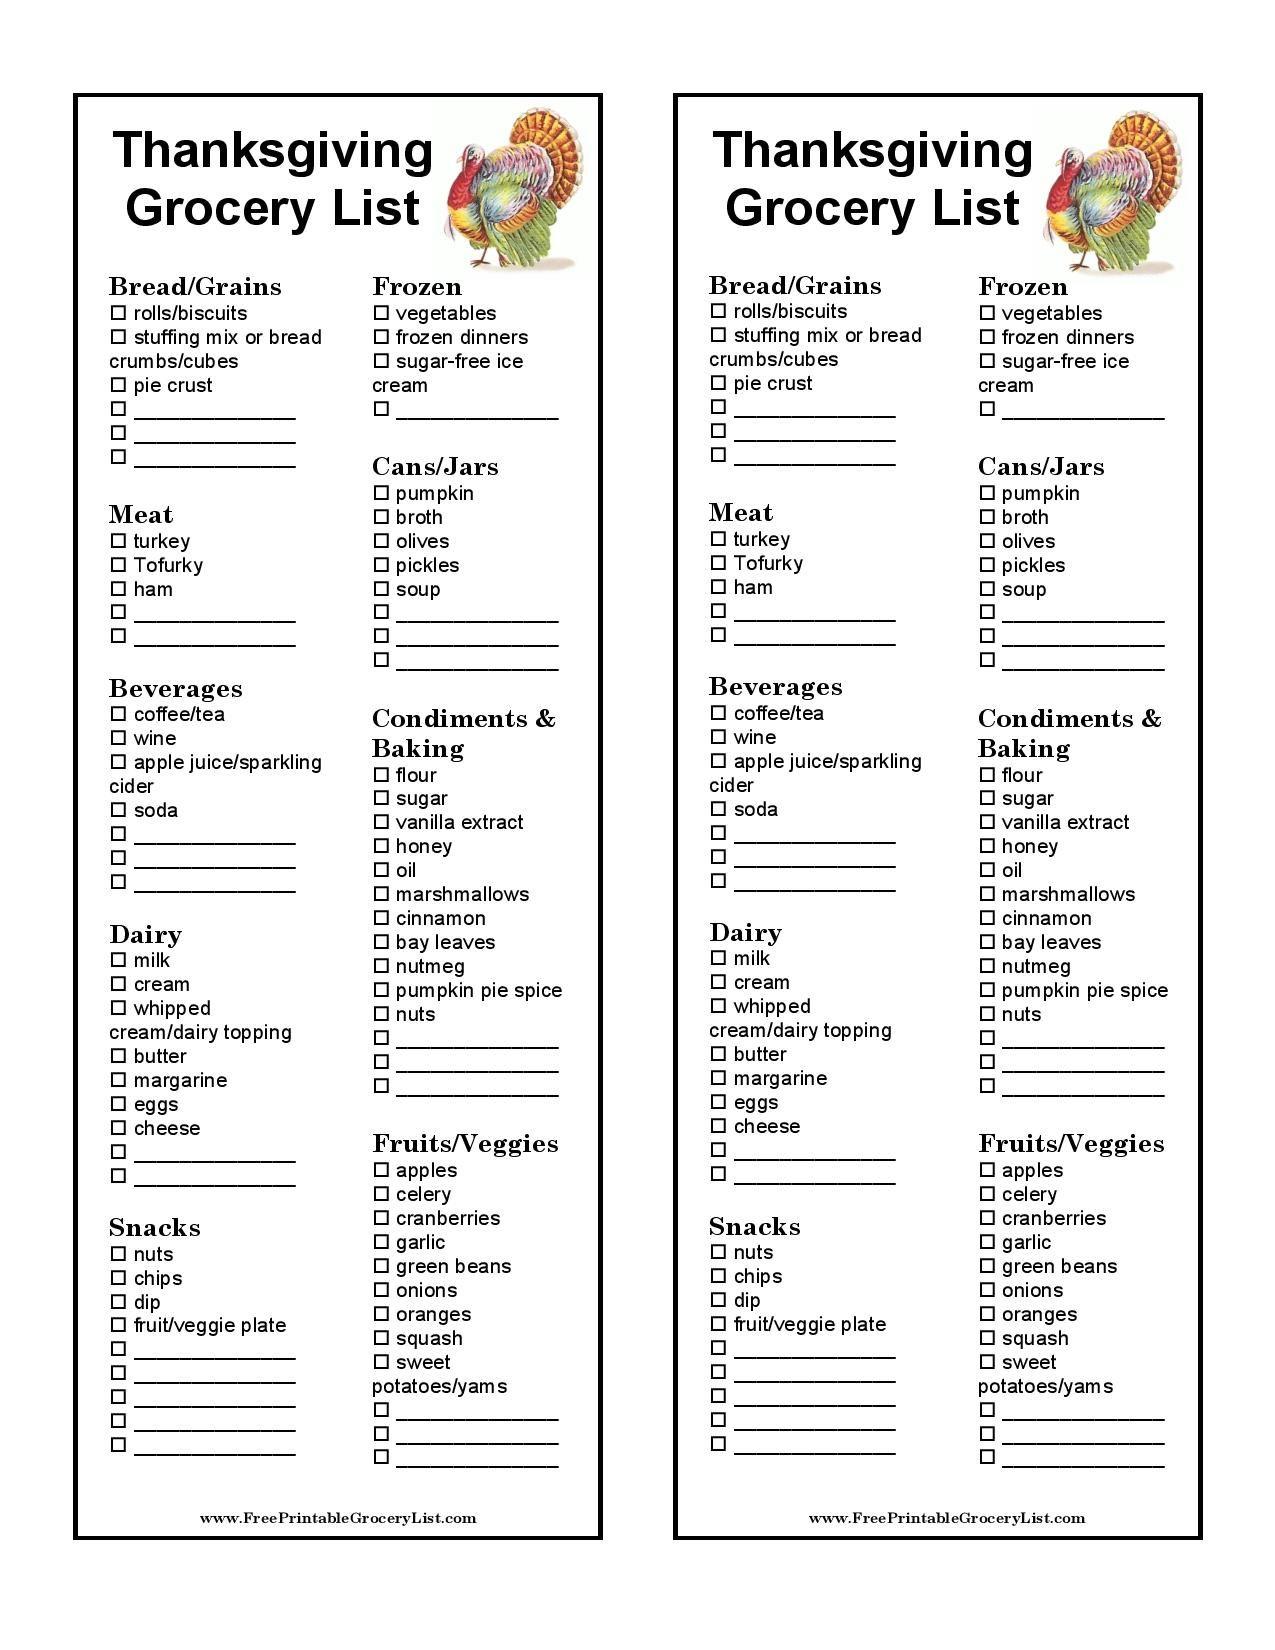 Free Printable Thanksgiving Grocery List Template Thanksgiving Grocery Thanksgiving Grocery List Thanksgiving Food List